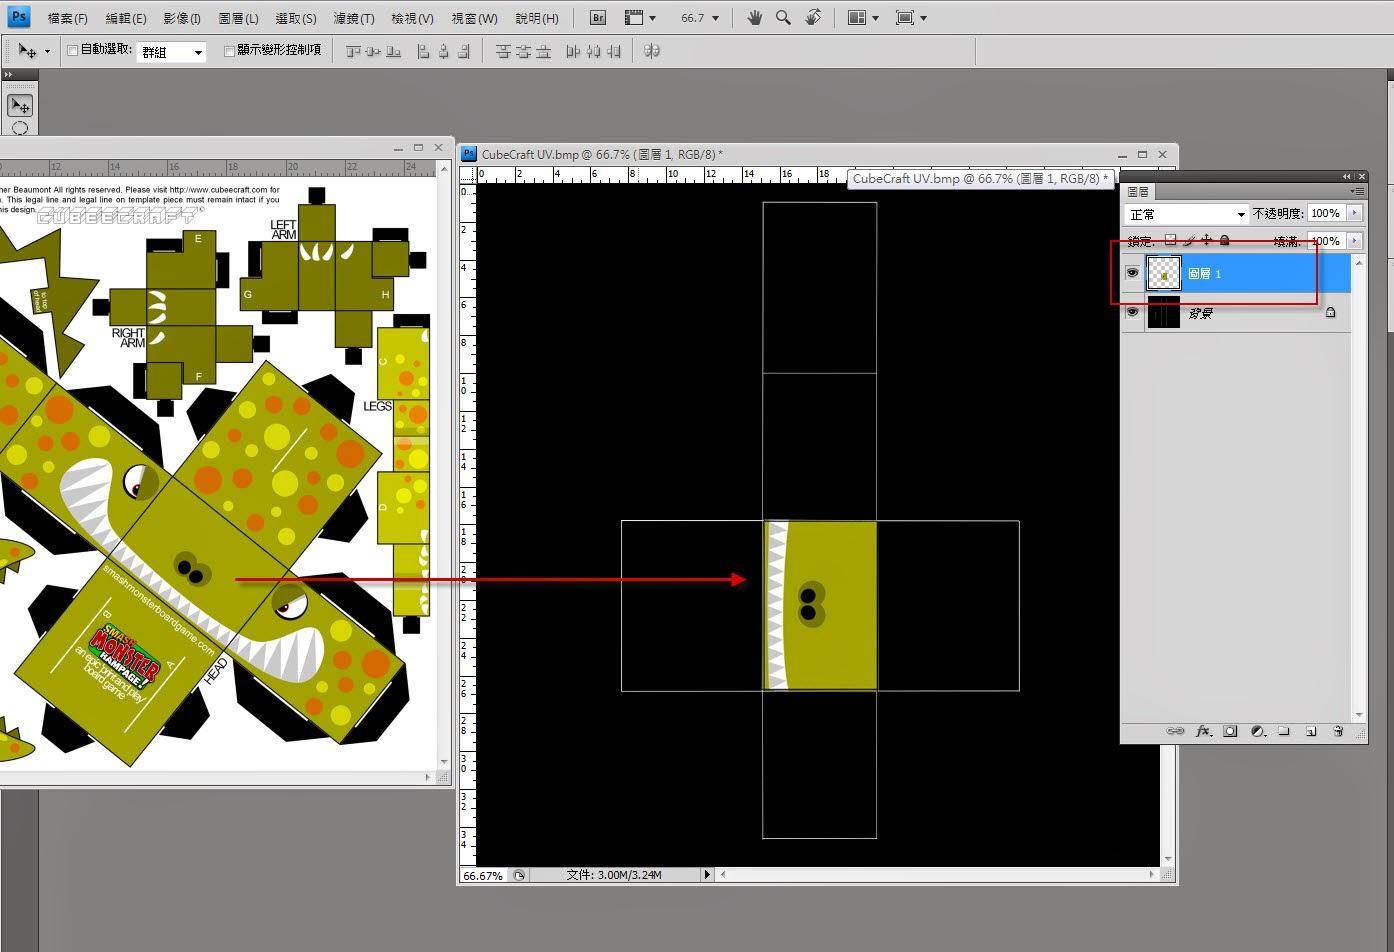 CubeCraft 24